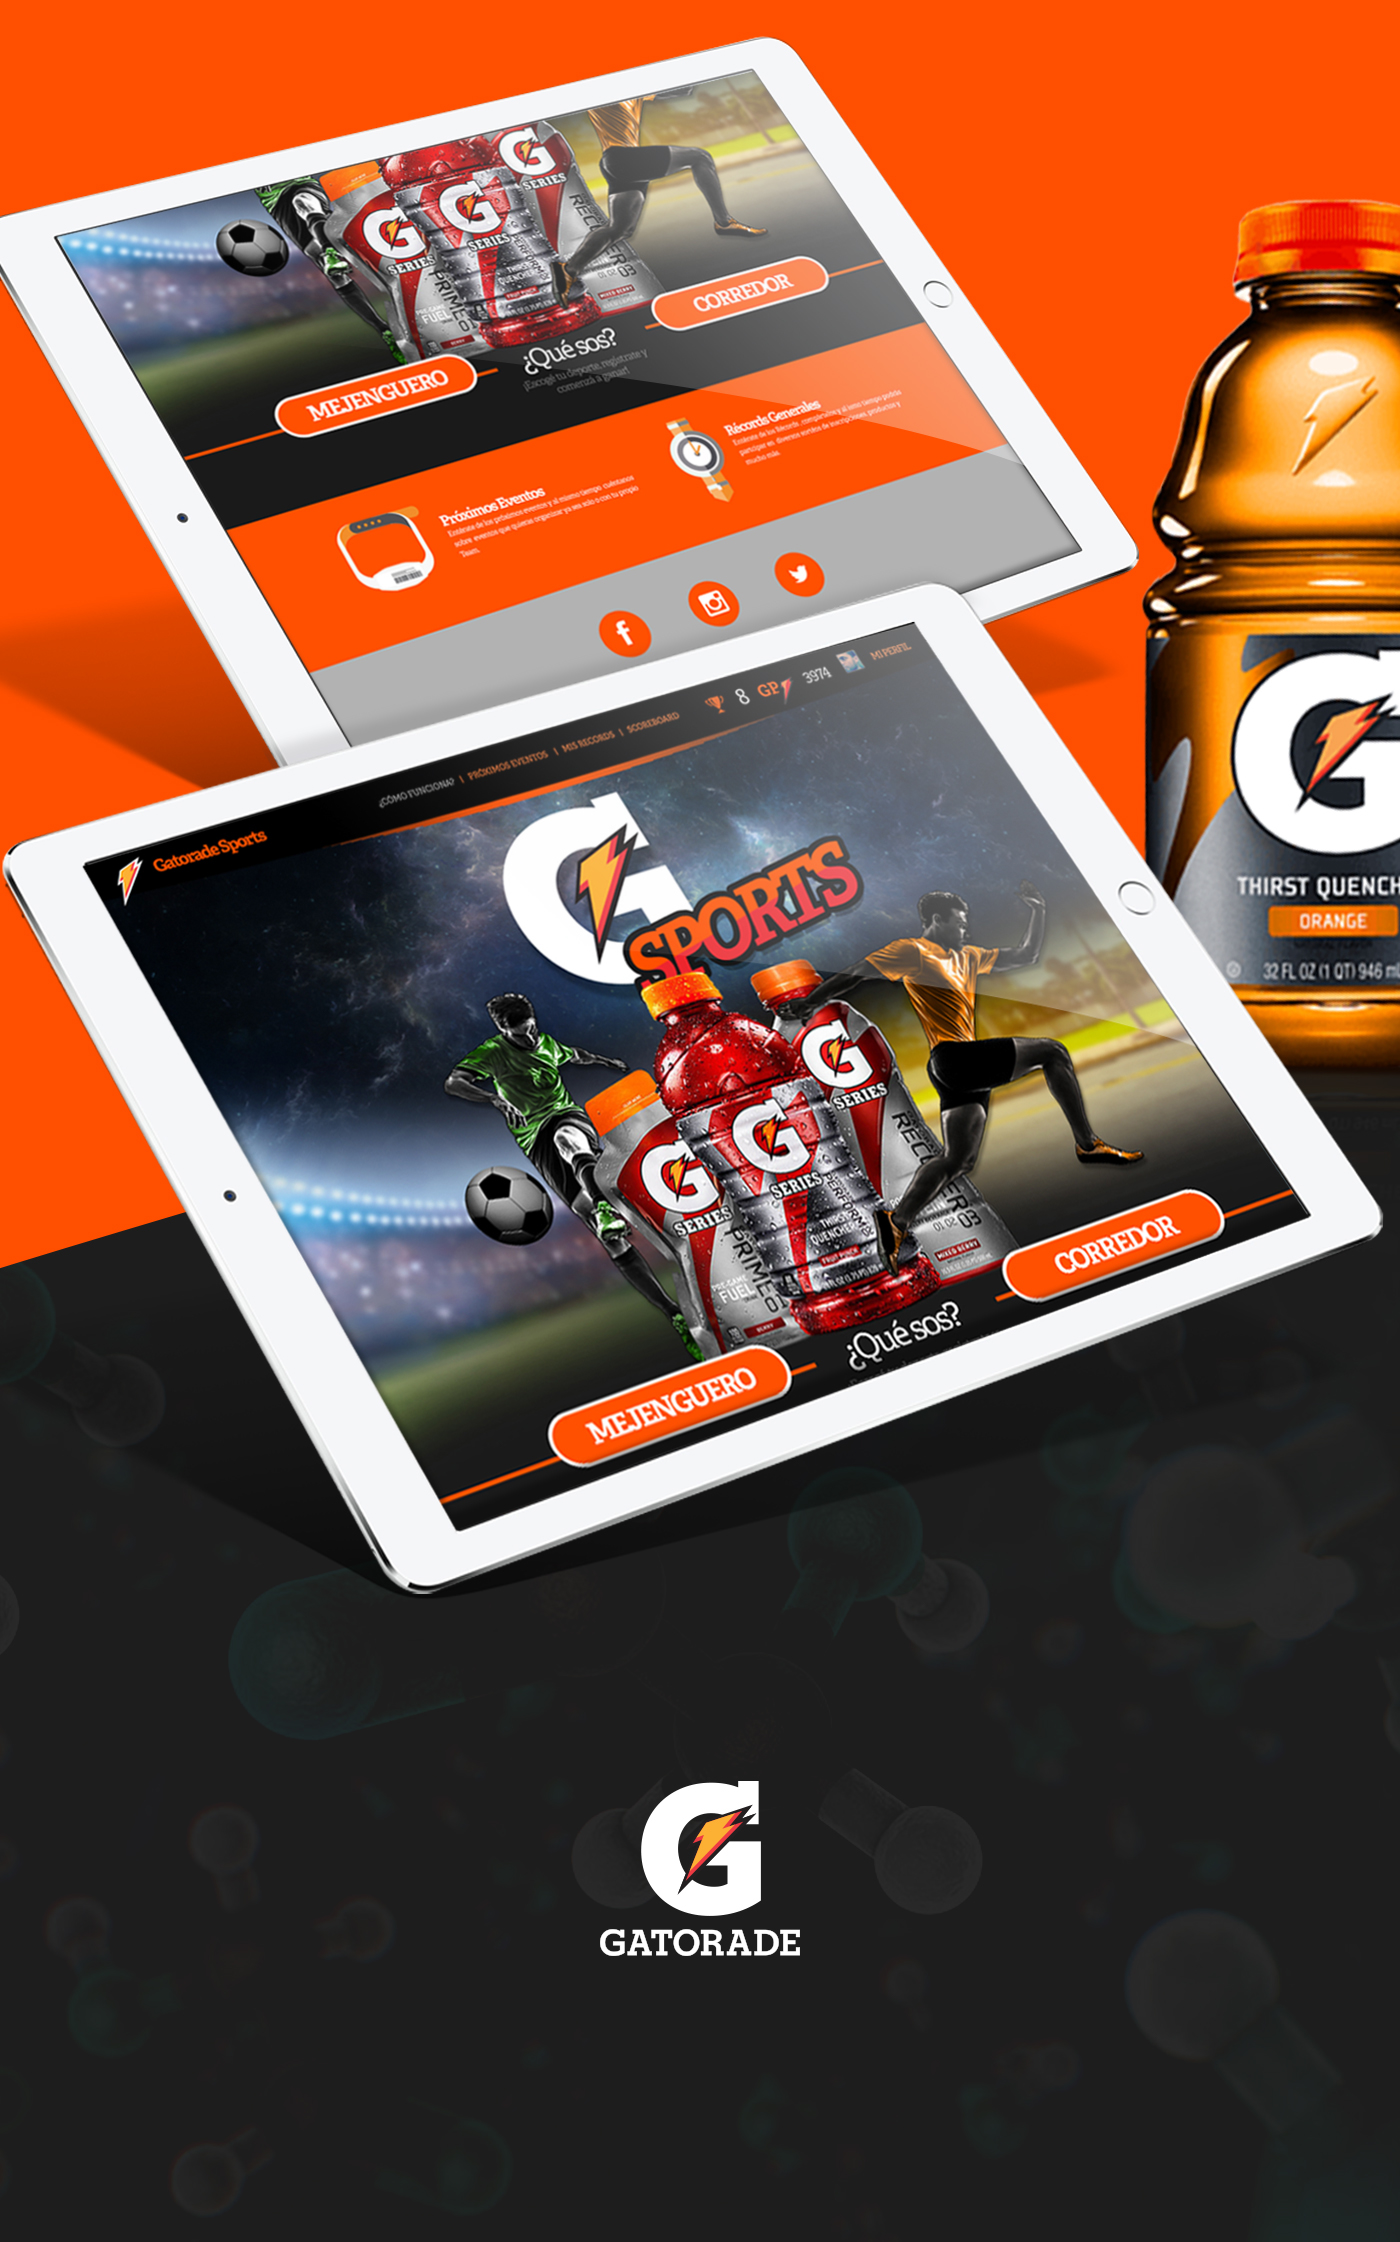 design dimernet gatorade sport run football app iPad Web orange drink energy